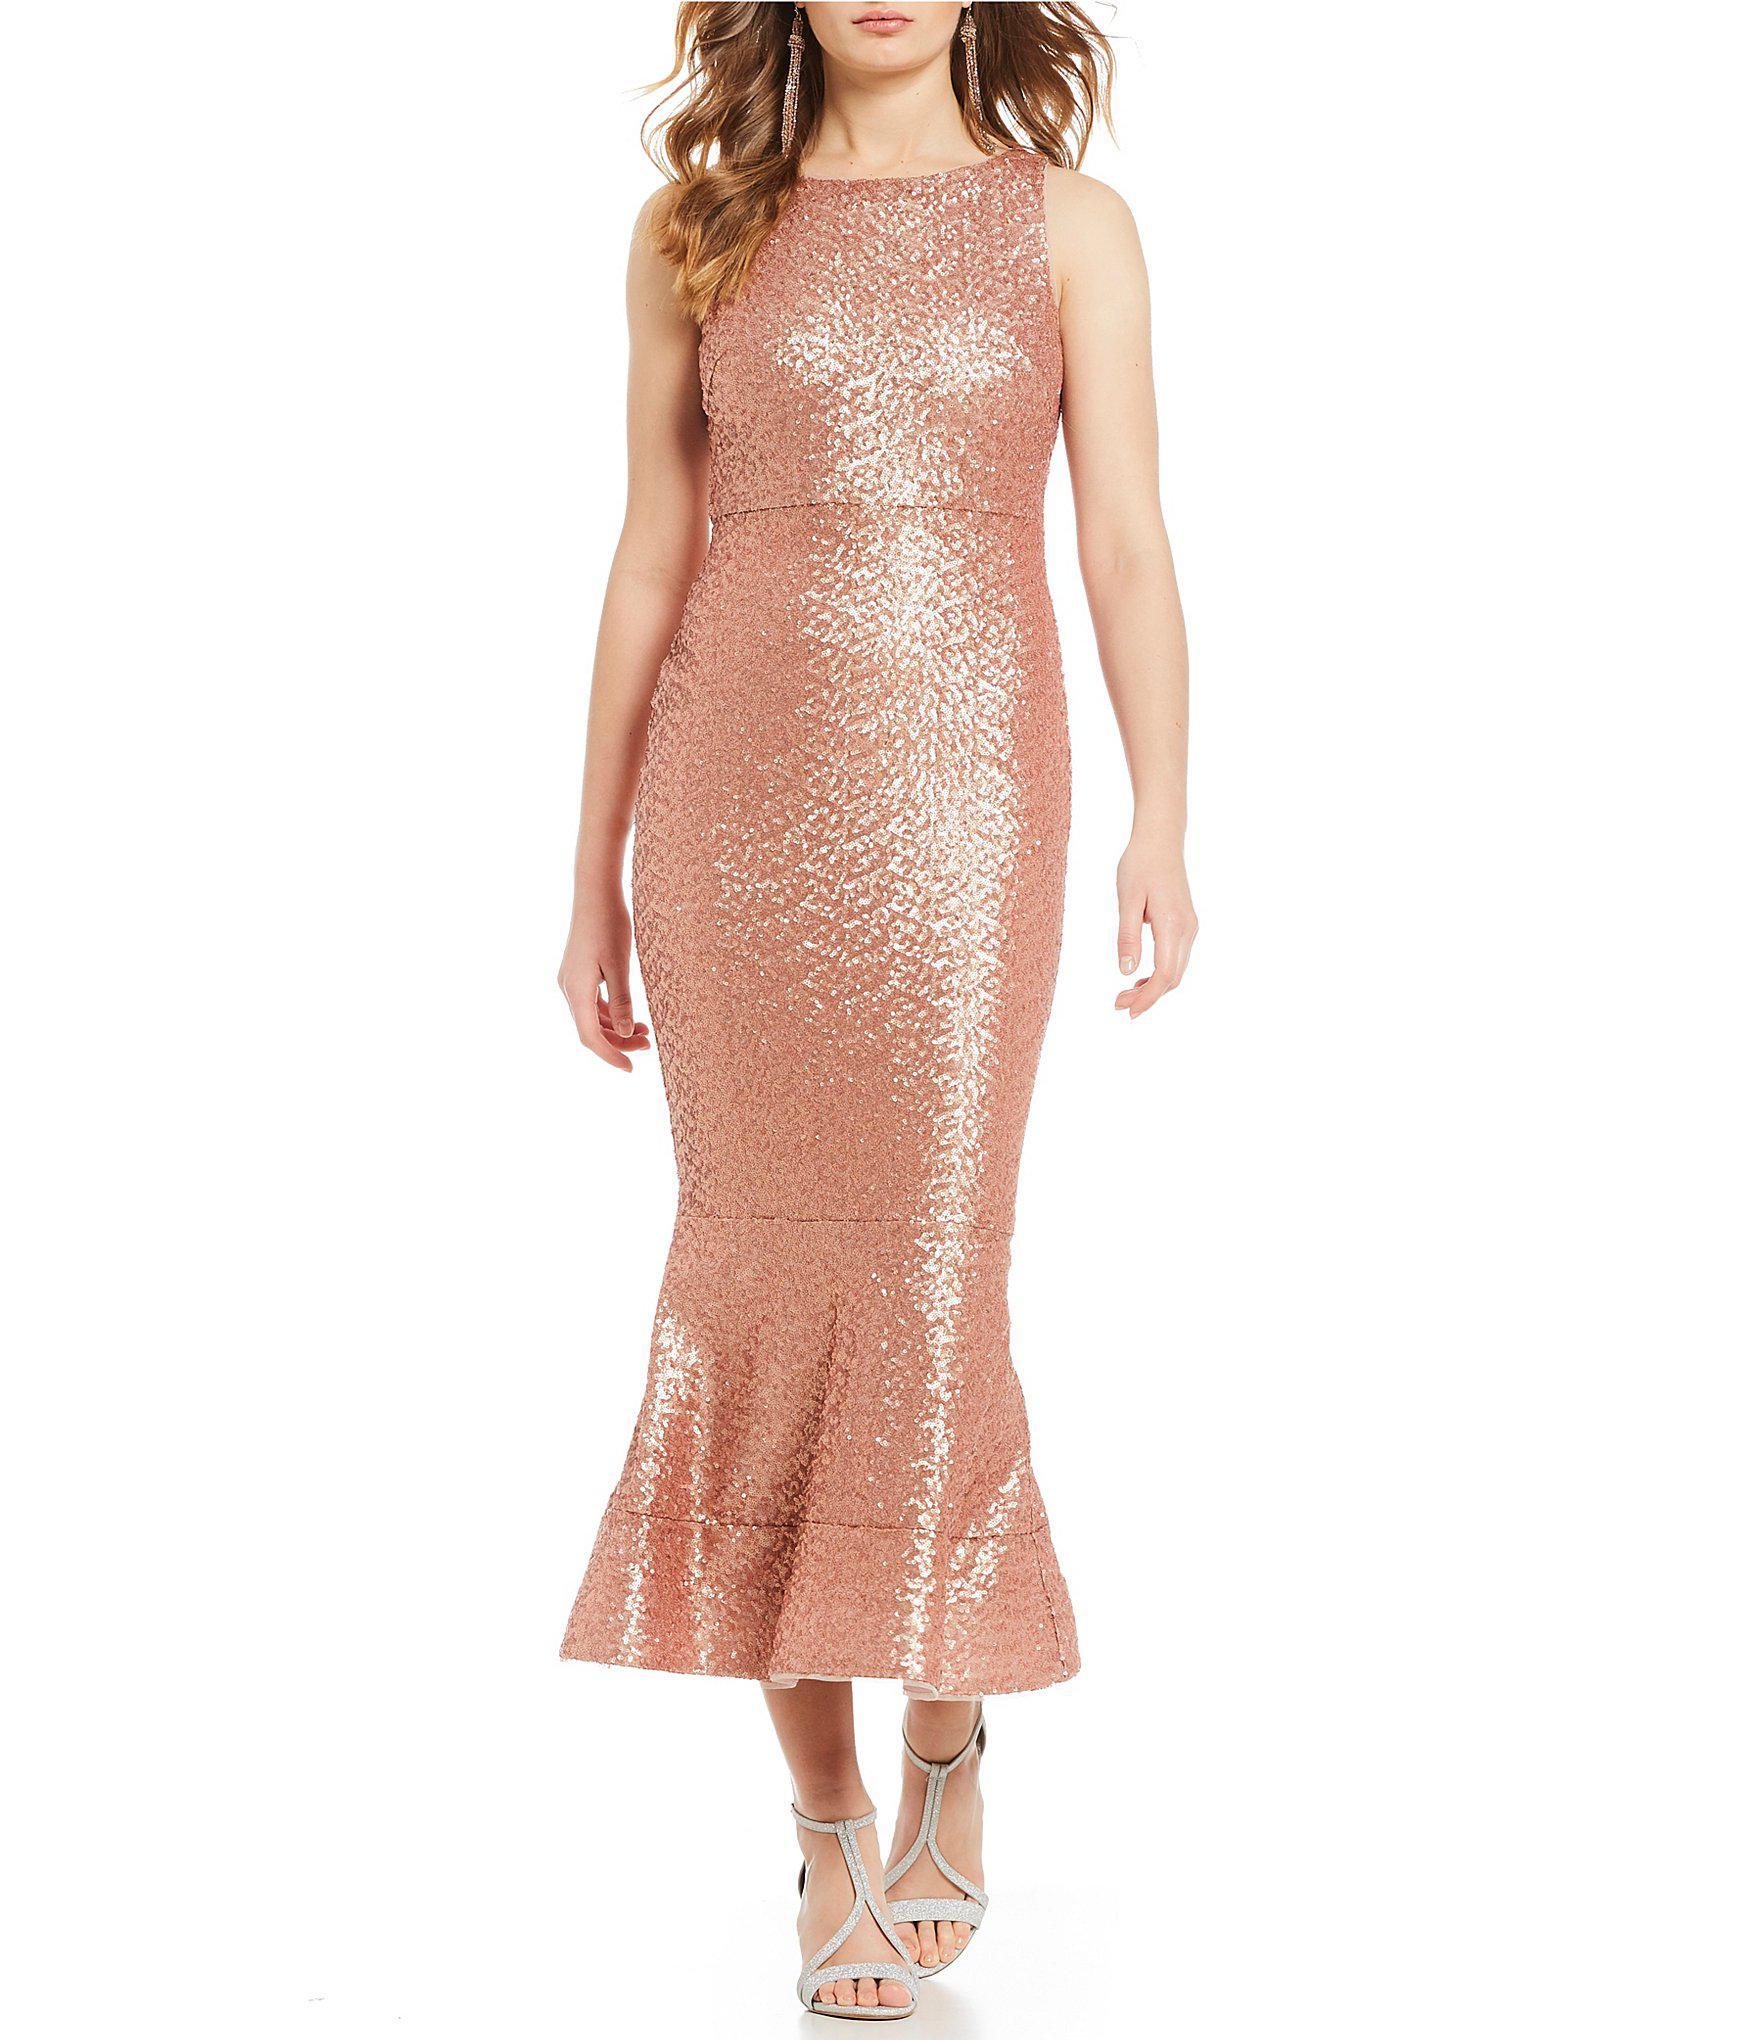 a014c1df9 Gianni Bini Juliet Sequin Midi Dress in Pink - Lyst